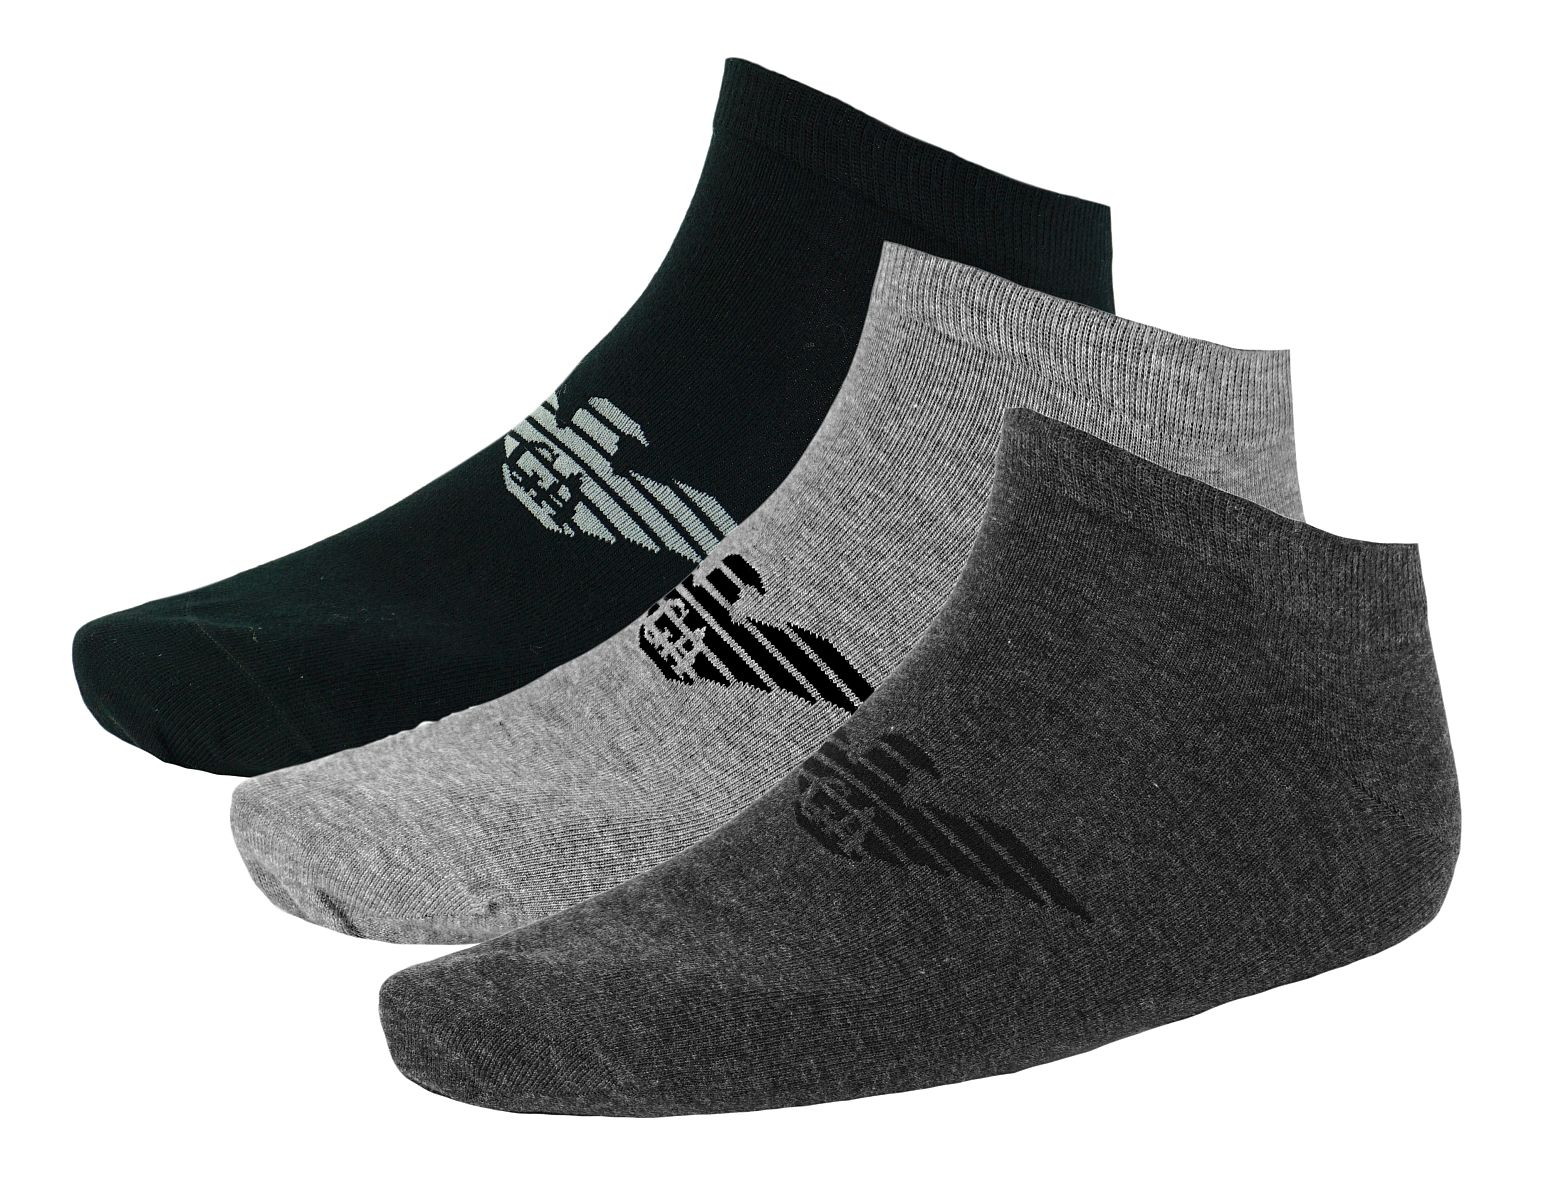 Emporio Armani 3er Pack Strümpfe Socken 8929BX Calza Inside 300008 7A234 07849 HW17-EAX1